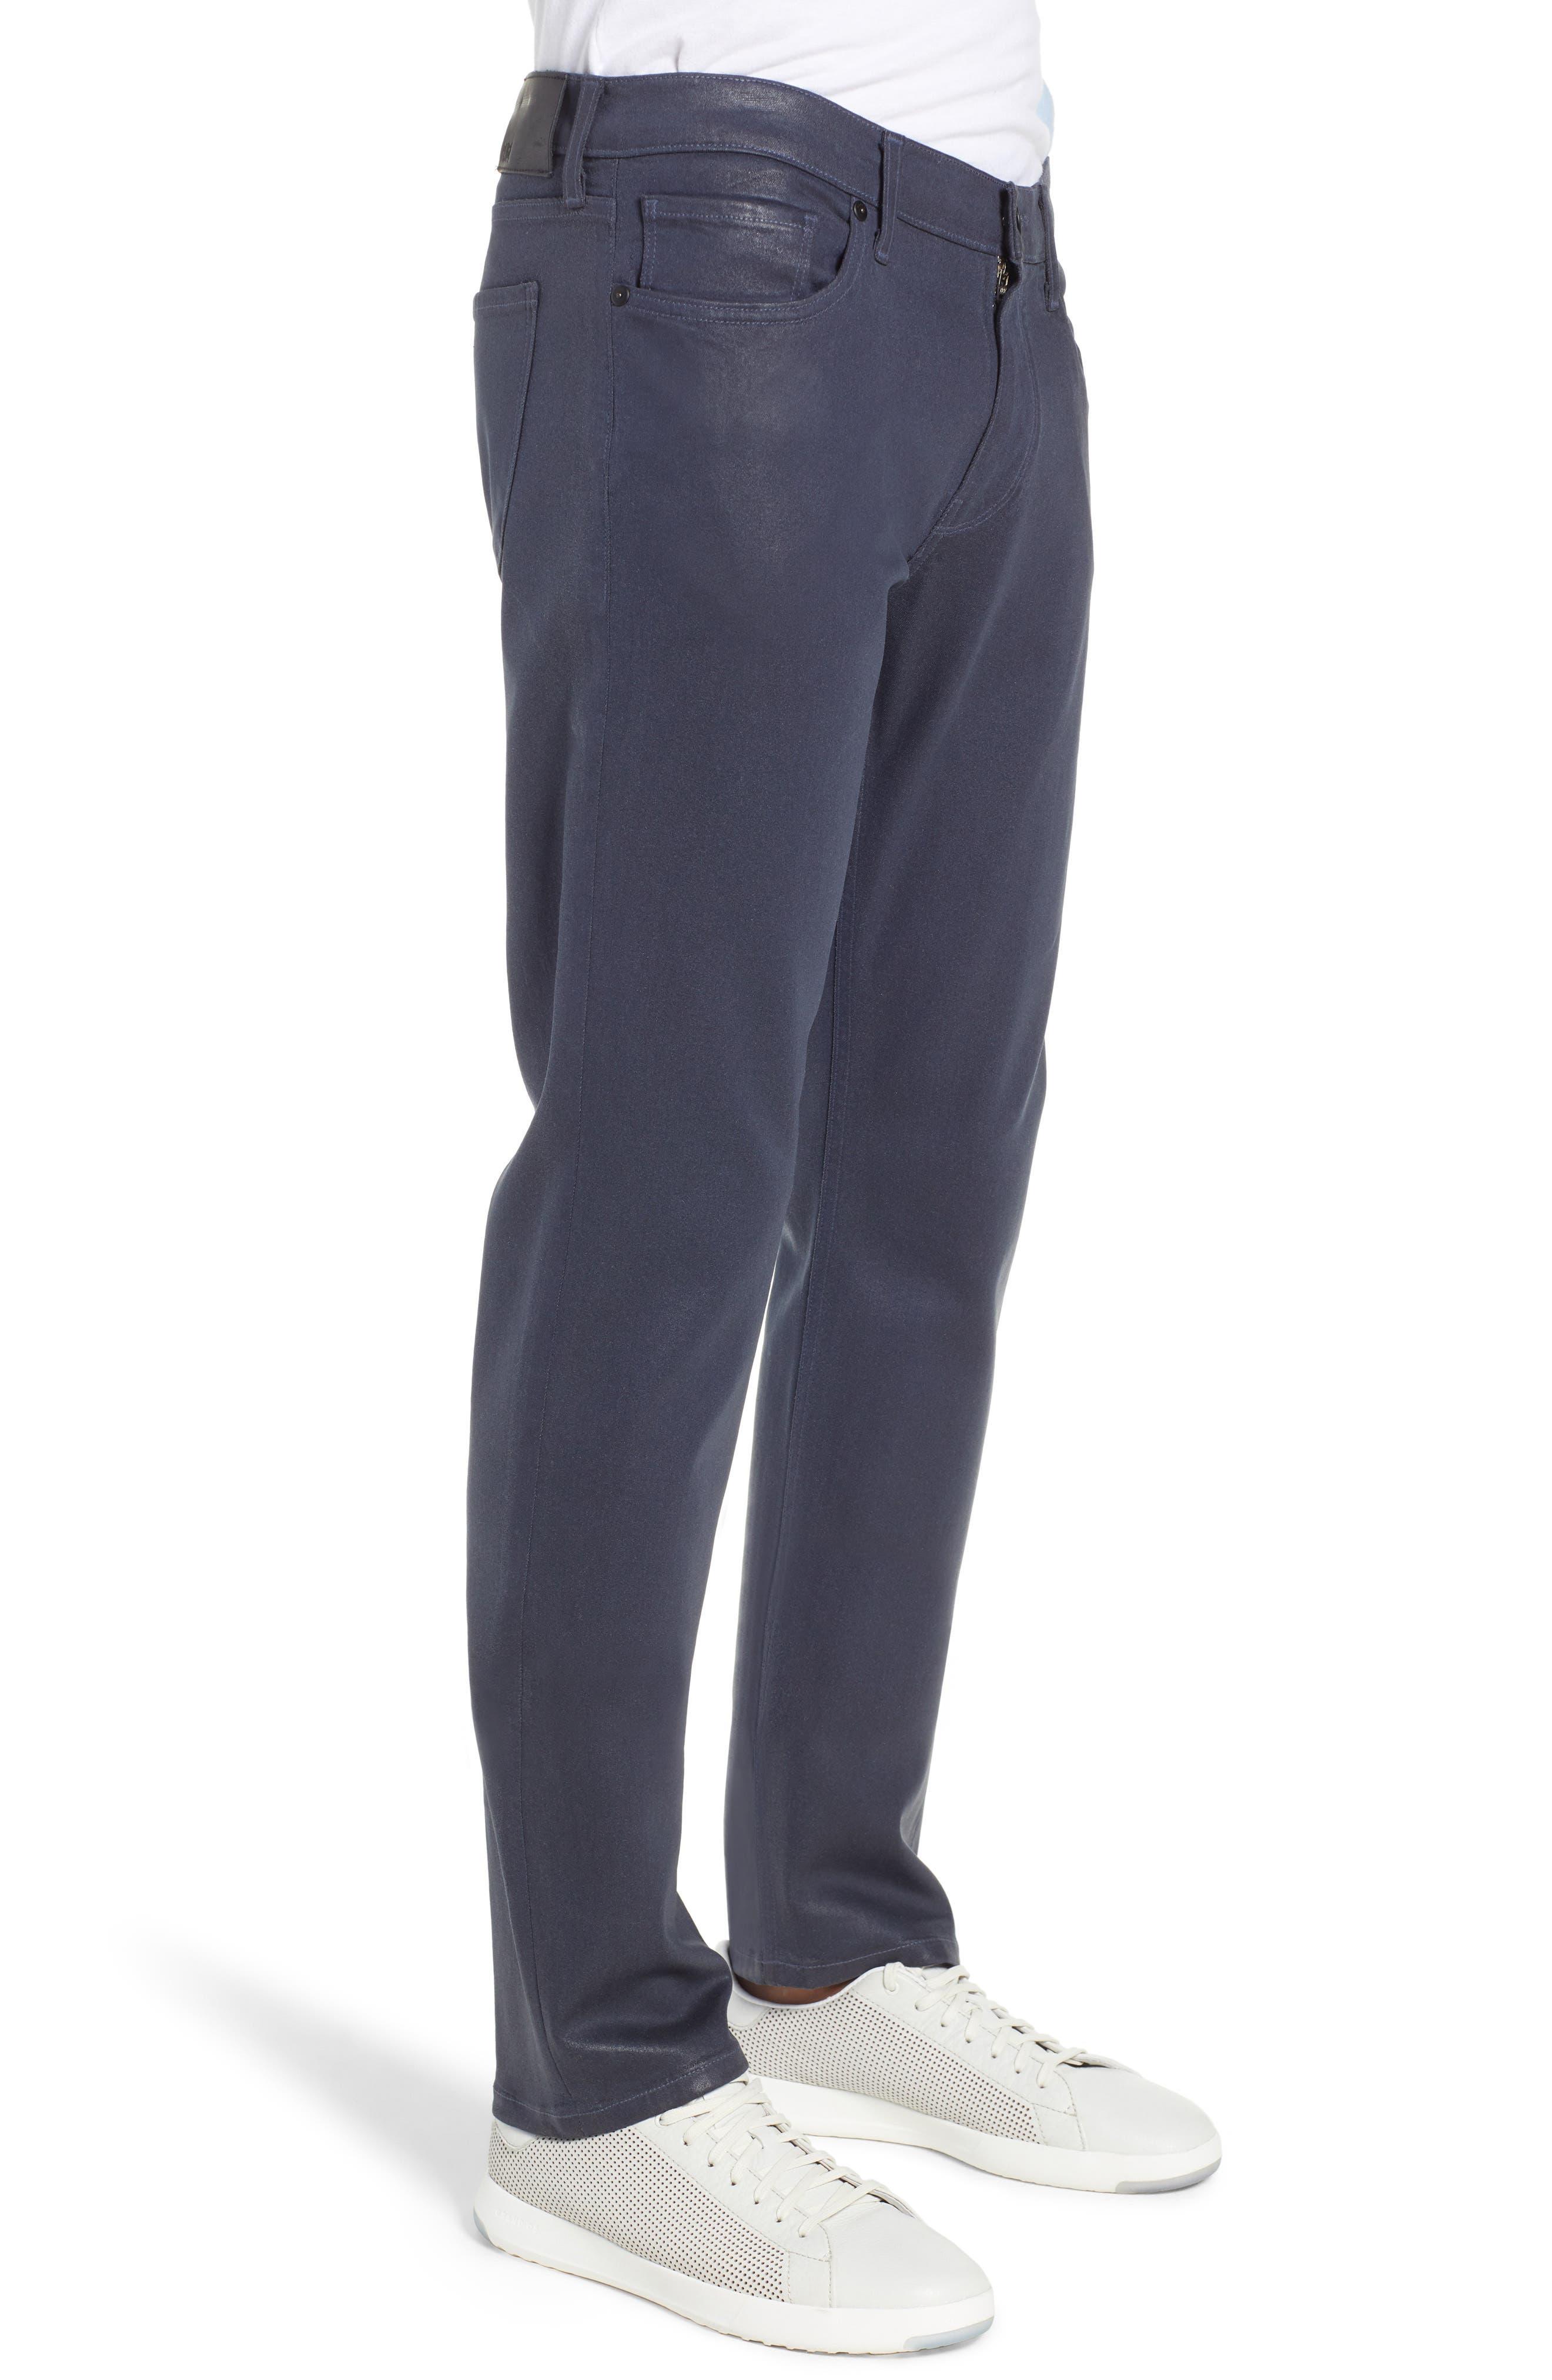 Transcend - Lennox Slim Fit Jeans,                             Alternate thumbnail 3, color,                             NIGHTFALL COATED